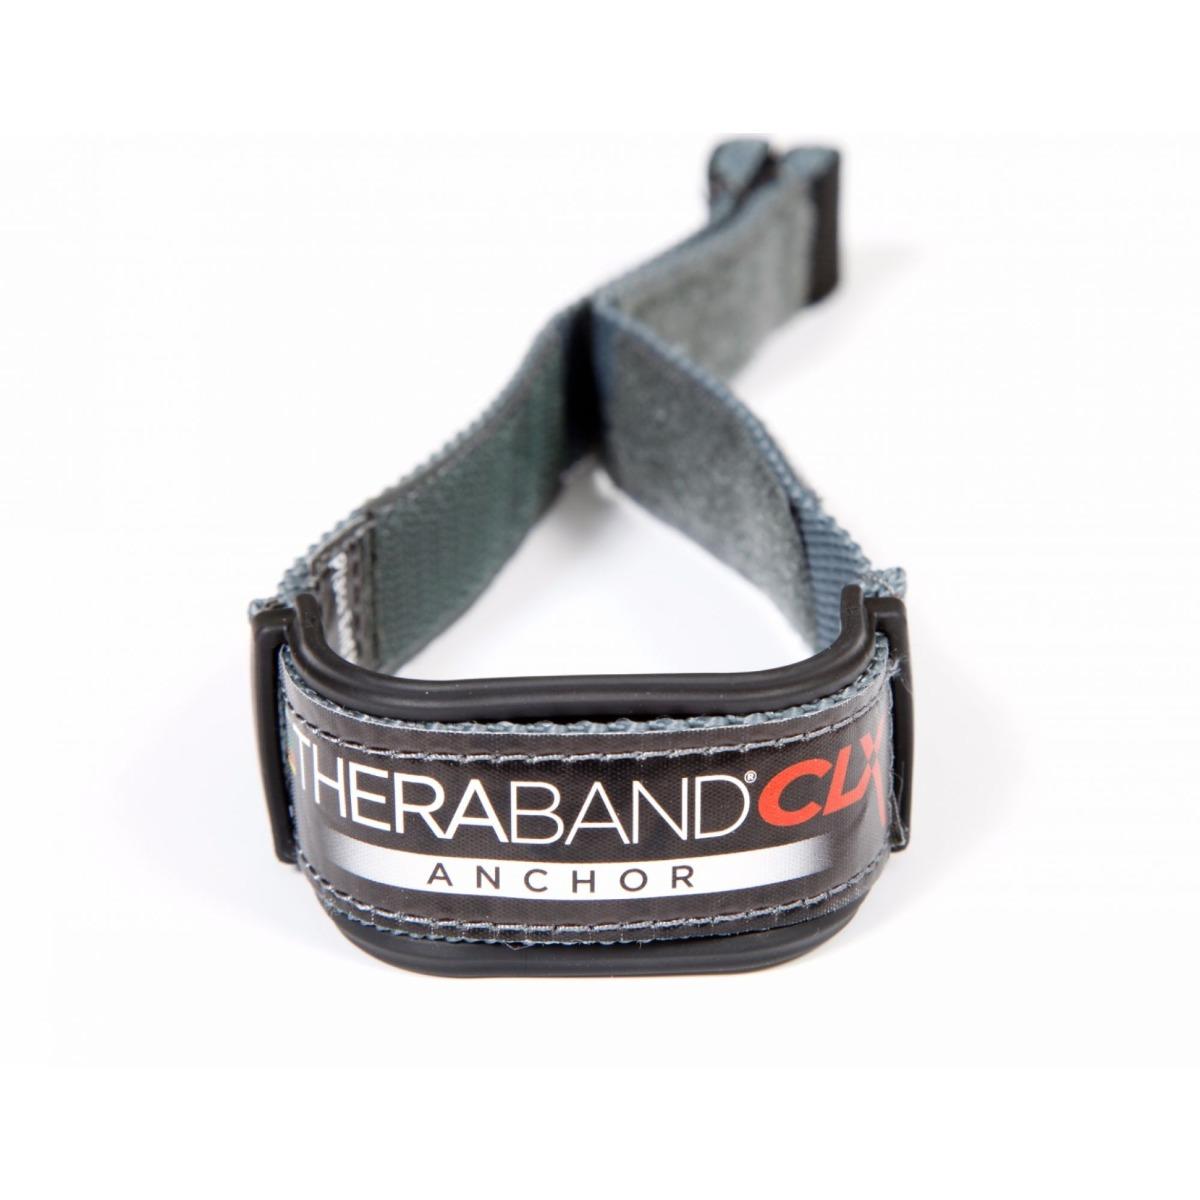 TheraBand black nylon Anchor